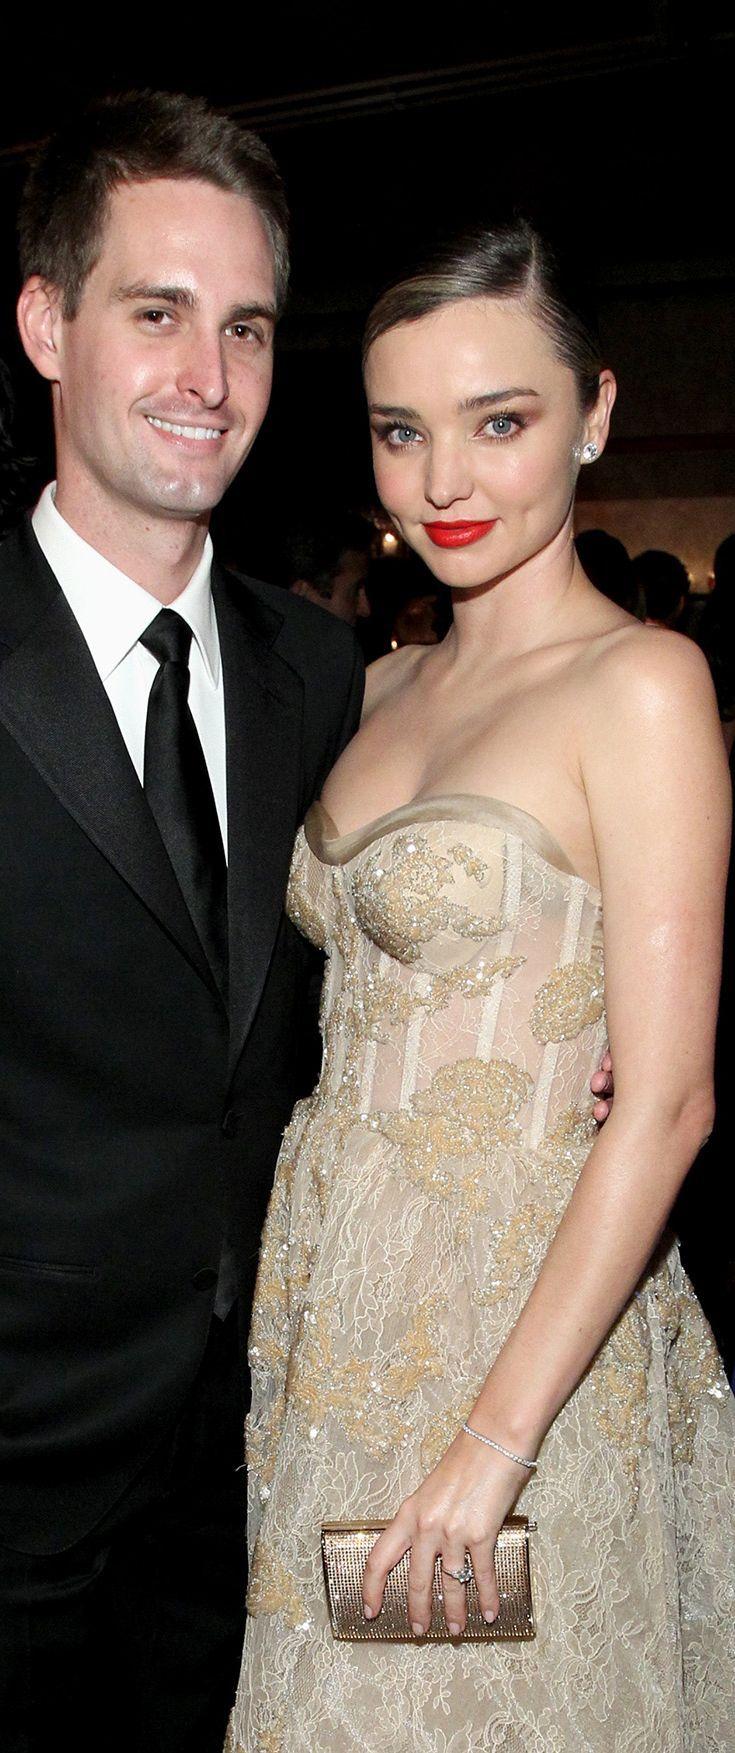 Miranda Kerr and Evan Spiegel Just Made It Official